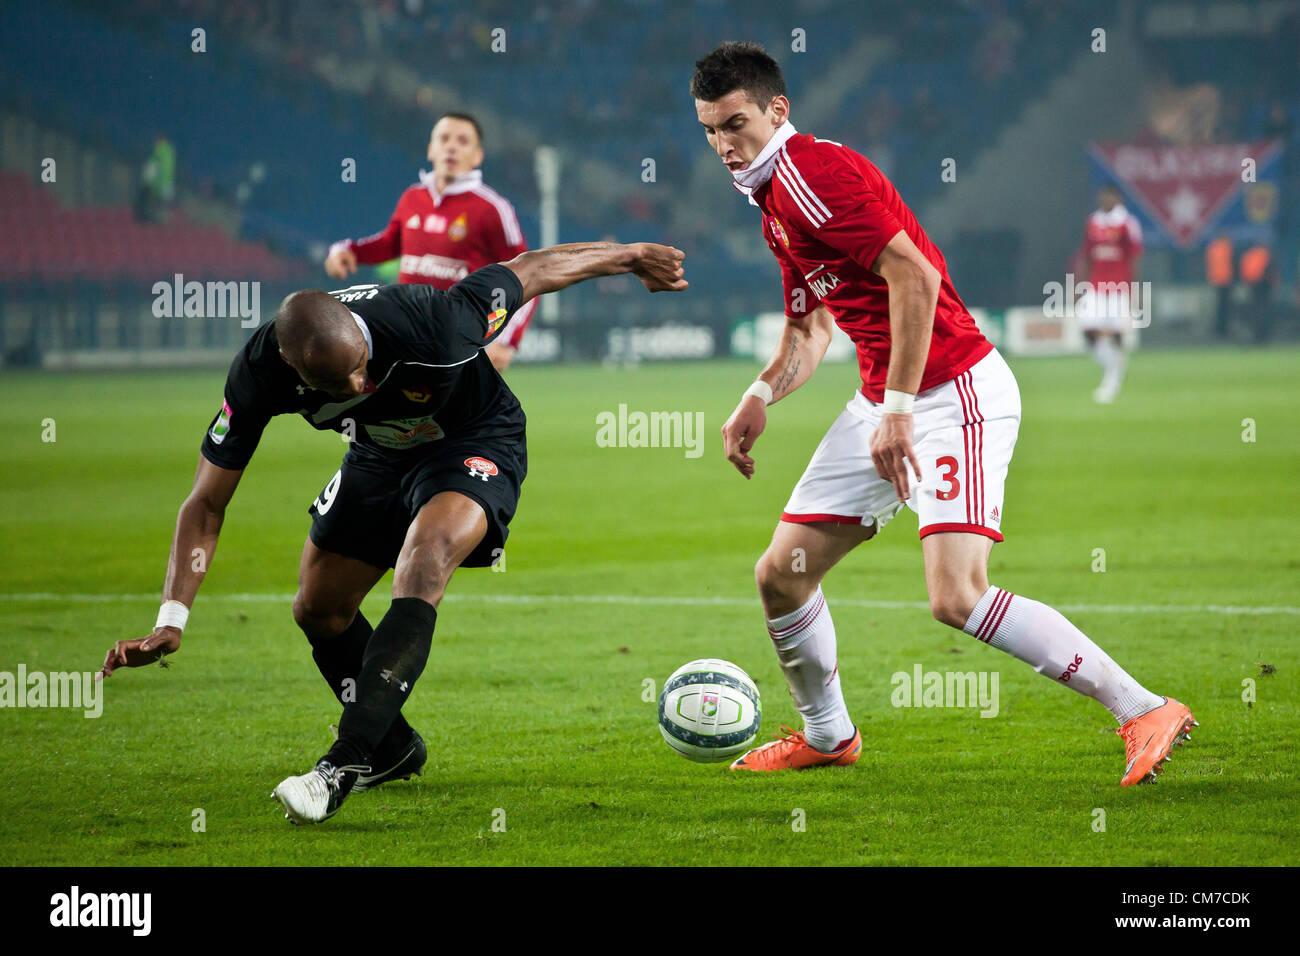 October 20, 2012 Cracow, Poland - Eighth round of Polish Football Extraleague. (L) Ugochukwu Ukah and (R) Gordan - Stock Image